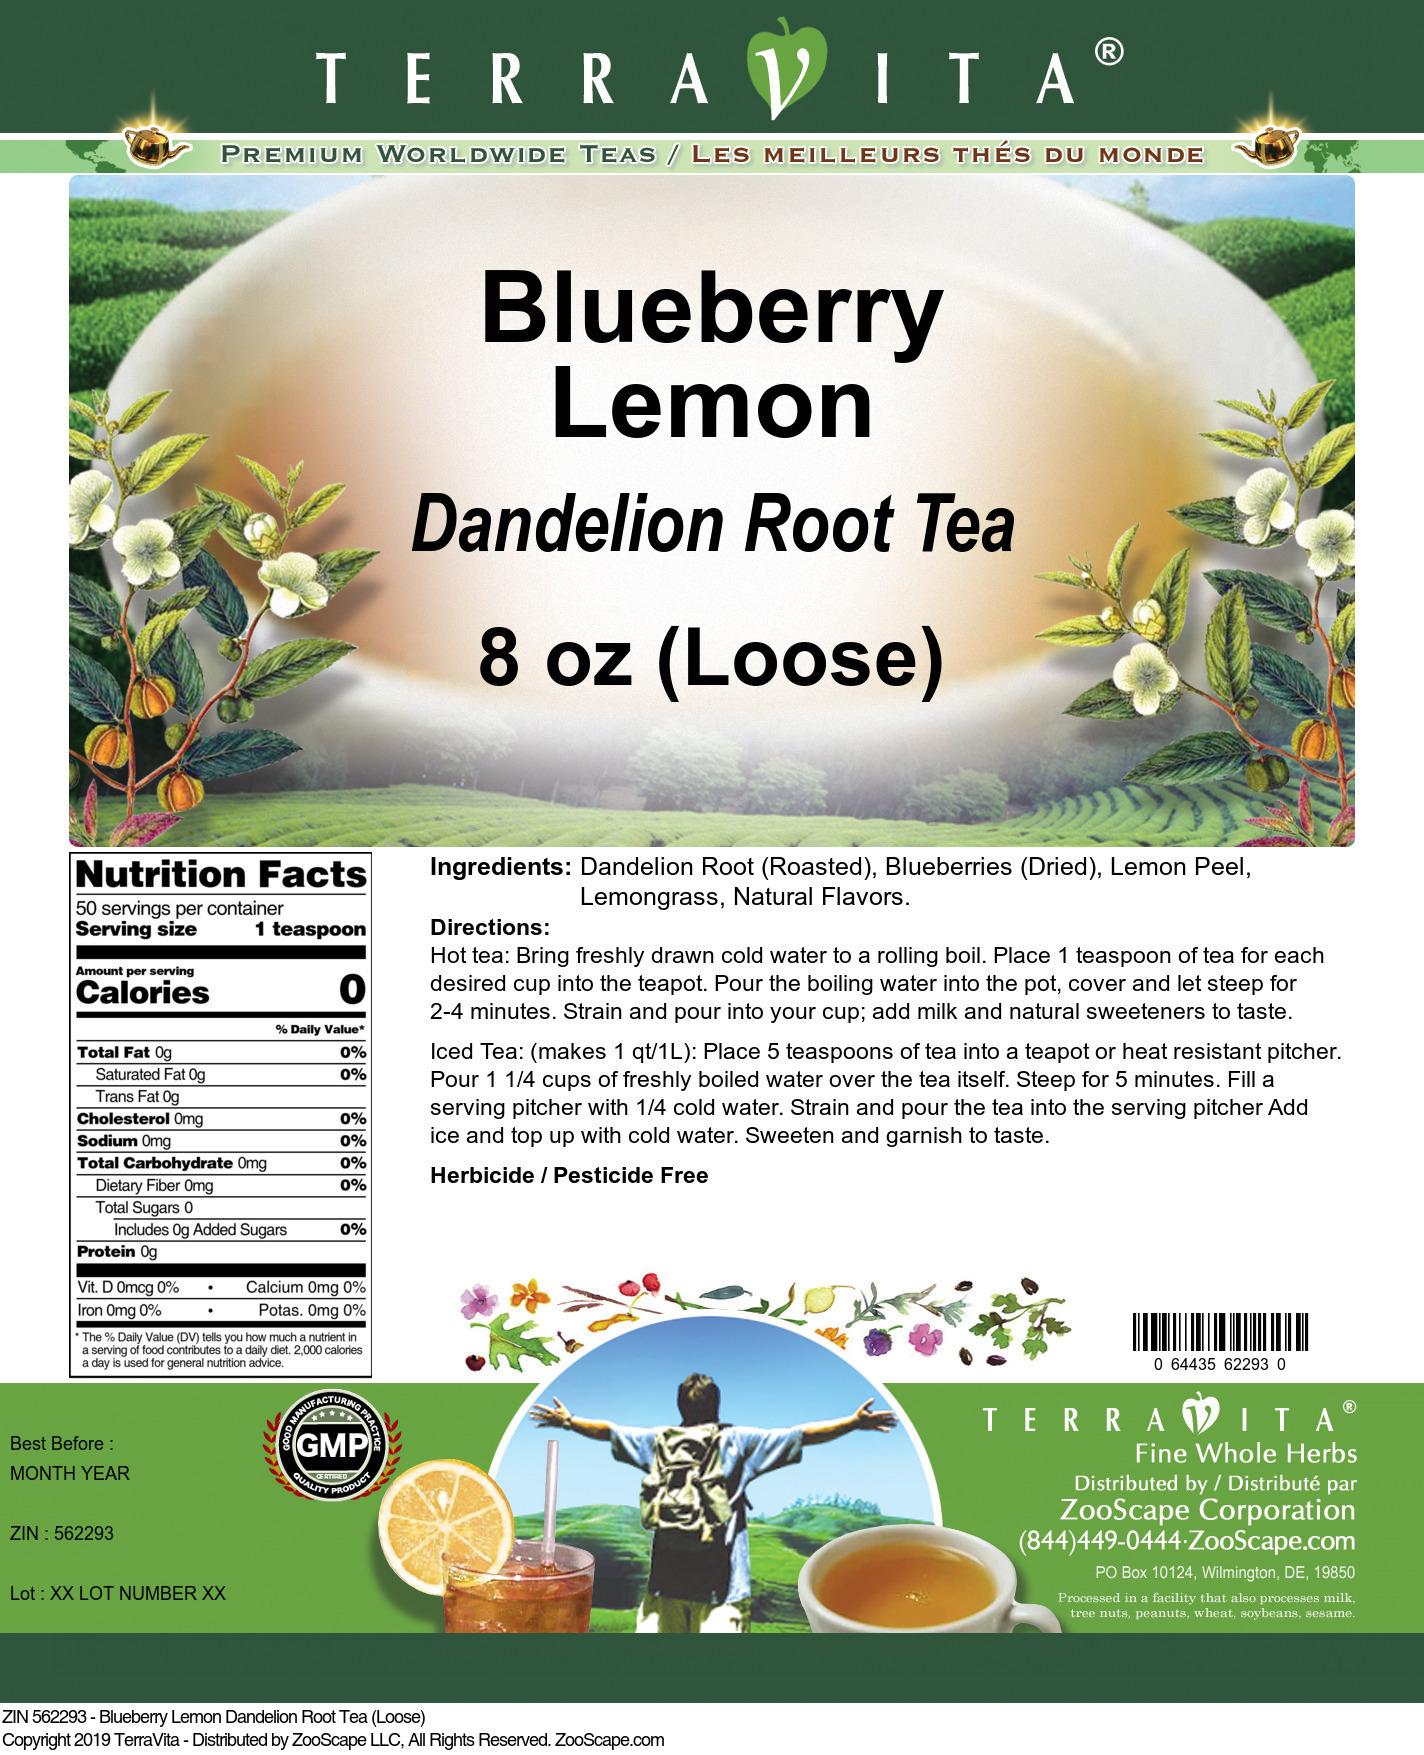 Blueberry Lemon Dandelion Root Tea (Loose)